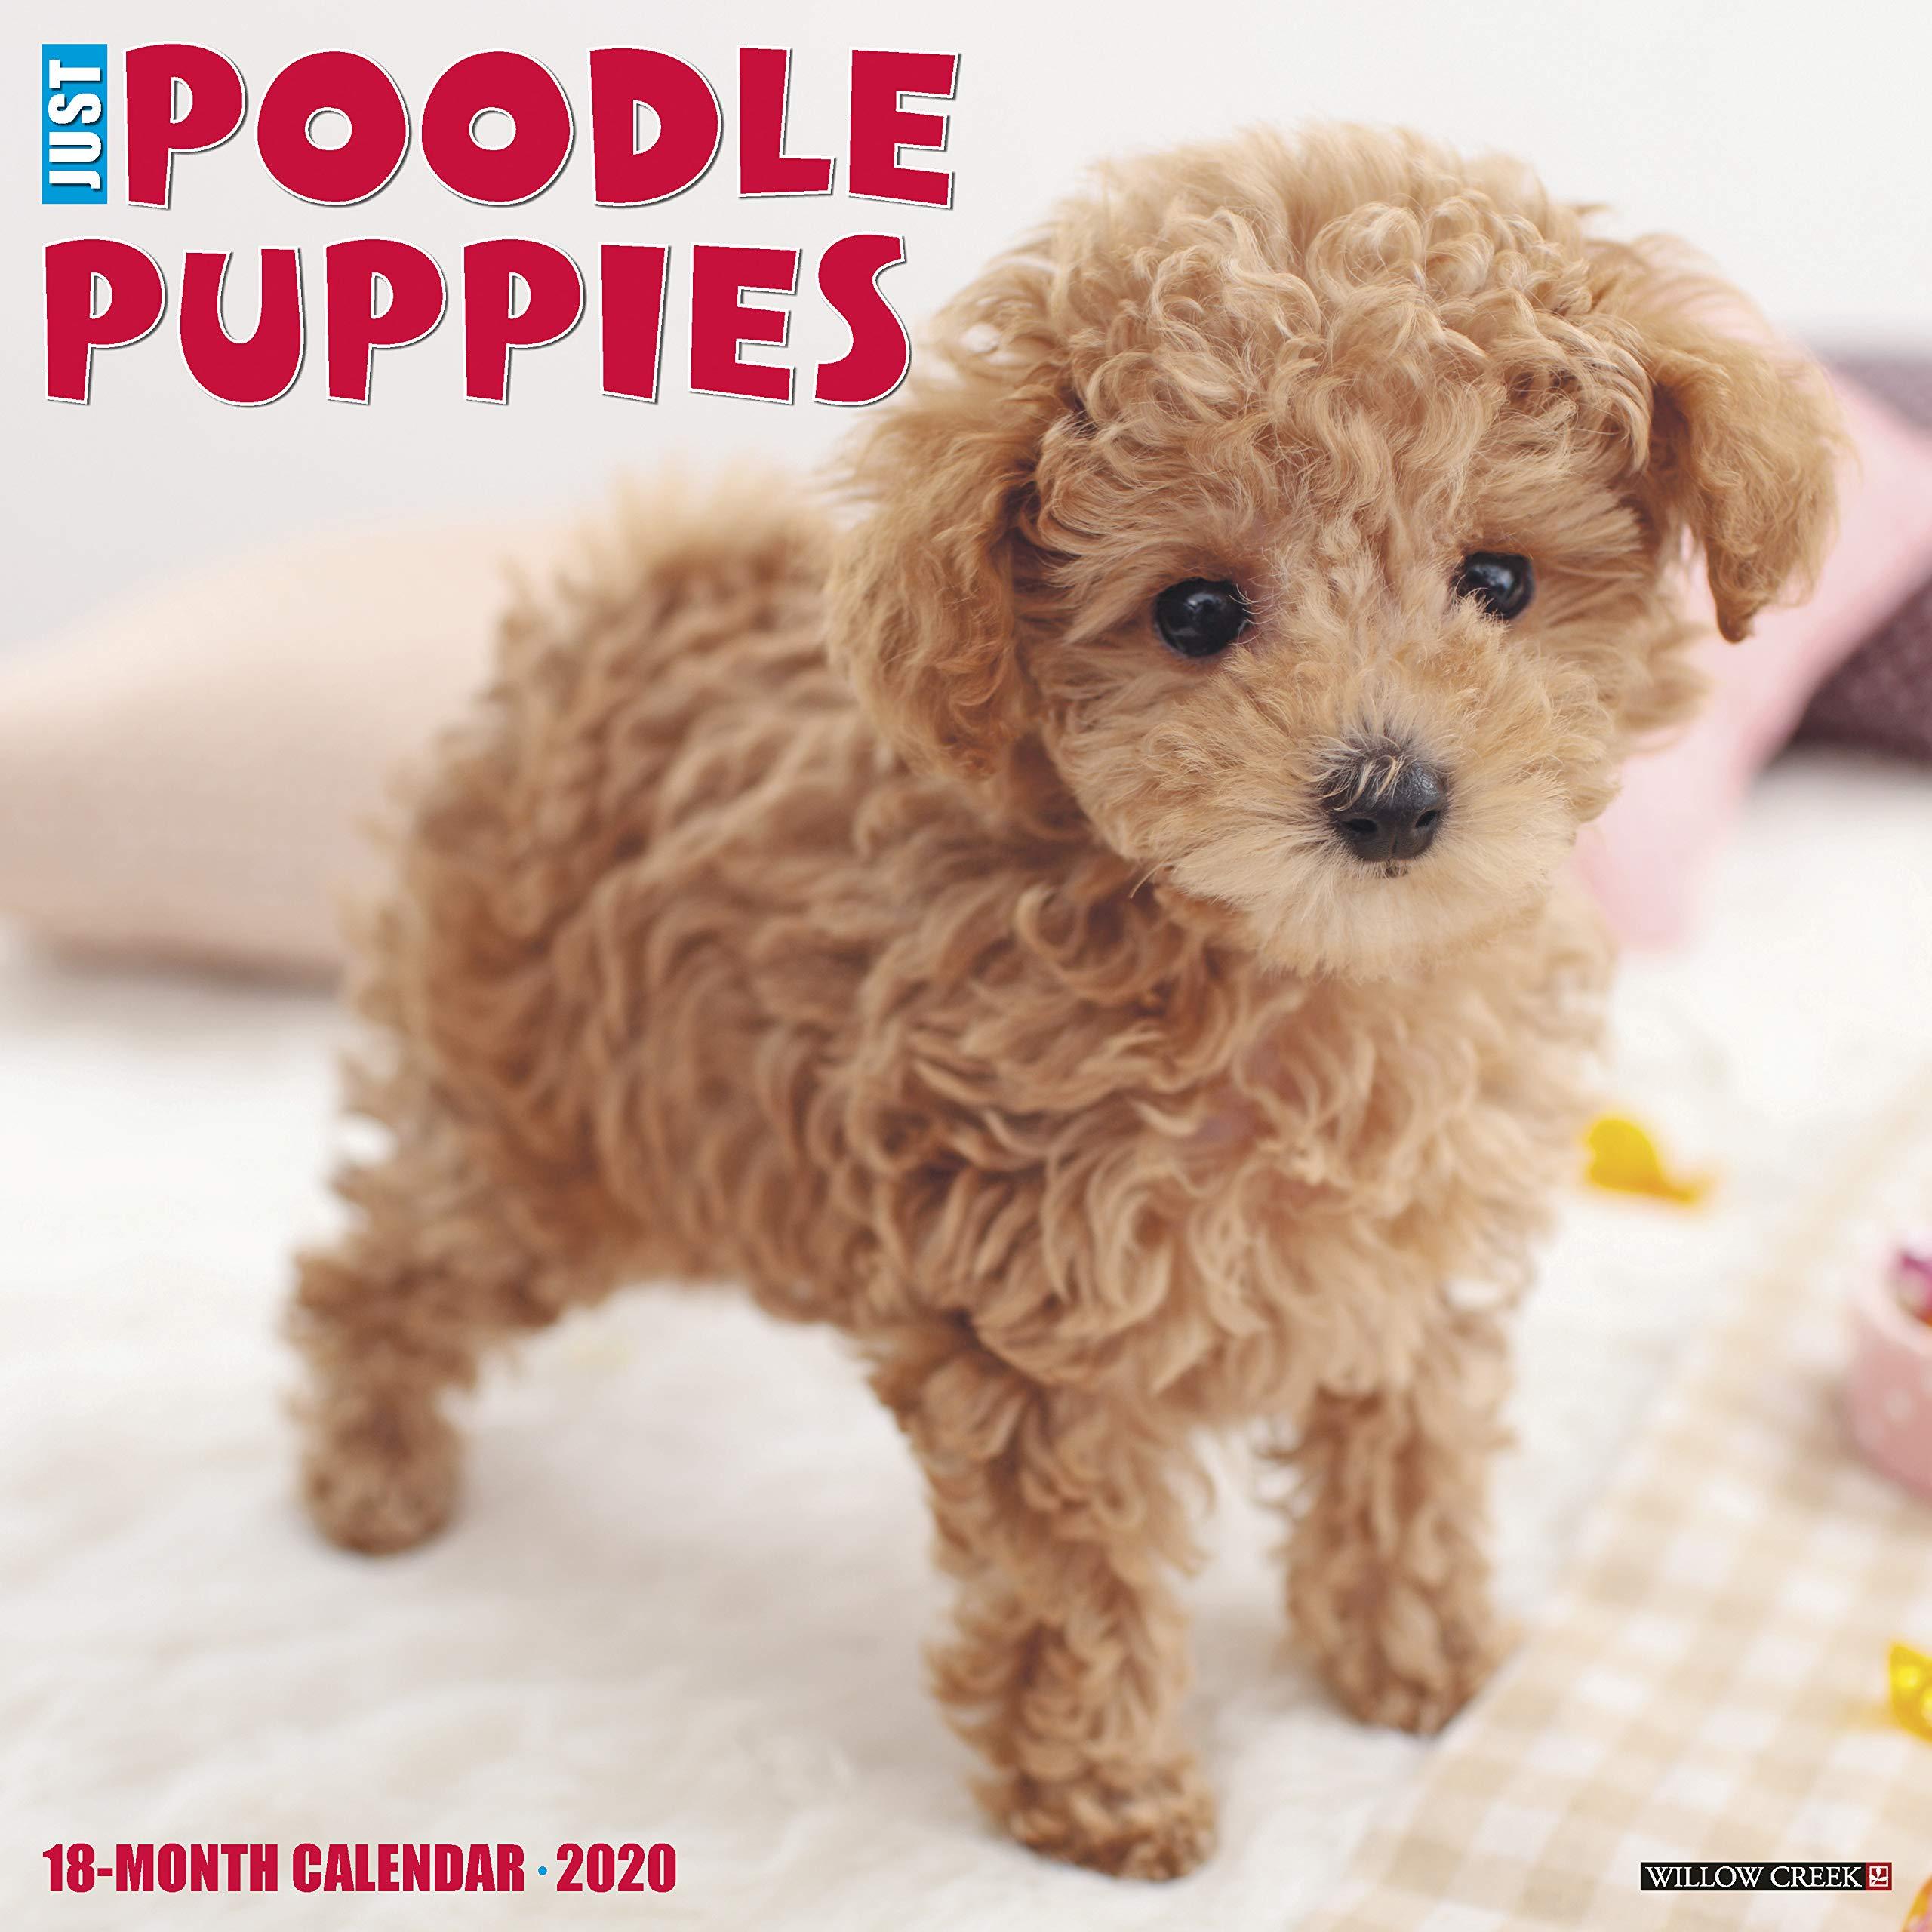 Just Poodle Puppies 2020 Wall Calendar Dog Breed Calendar Willow Creek Press 0709786051724 Amazon Com Books